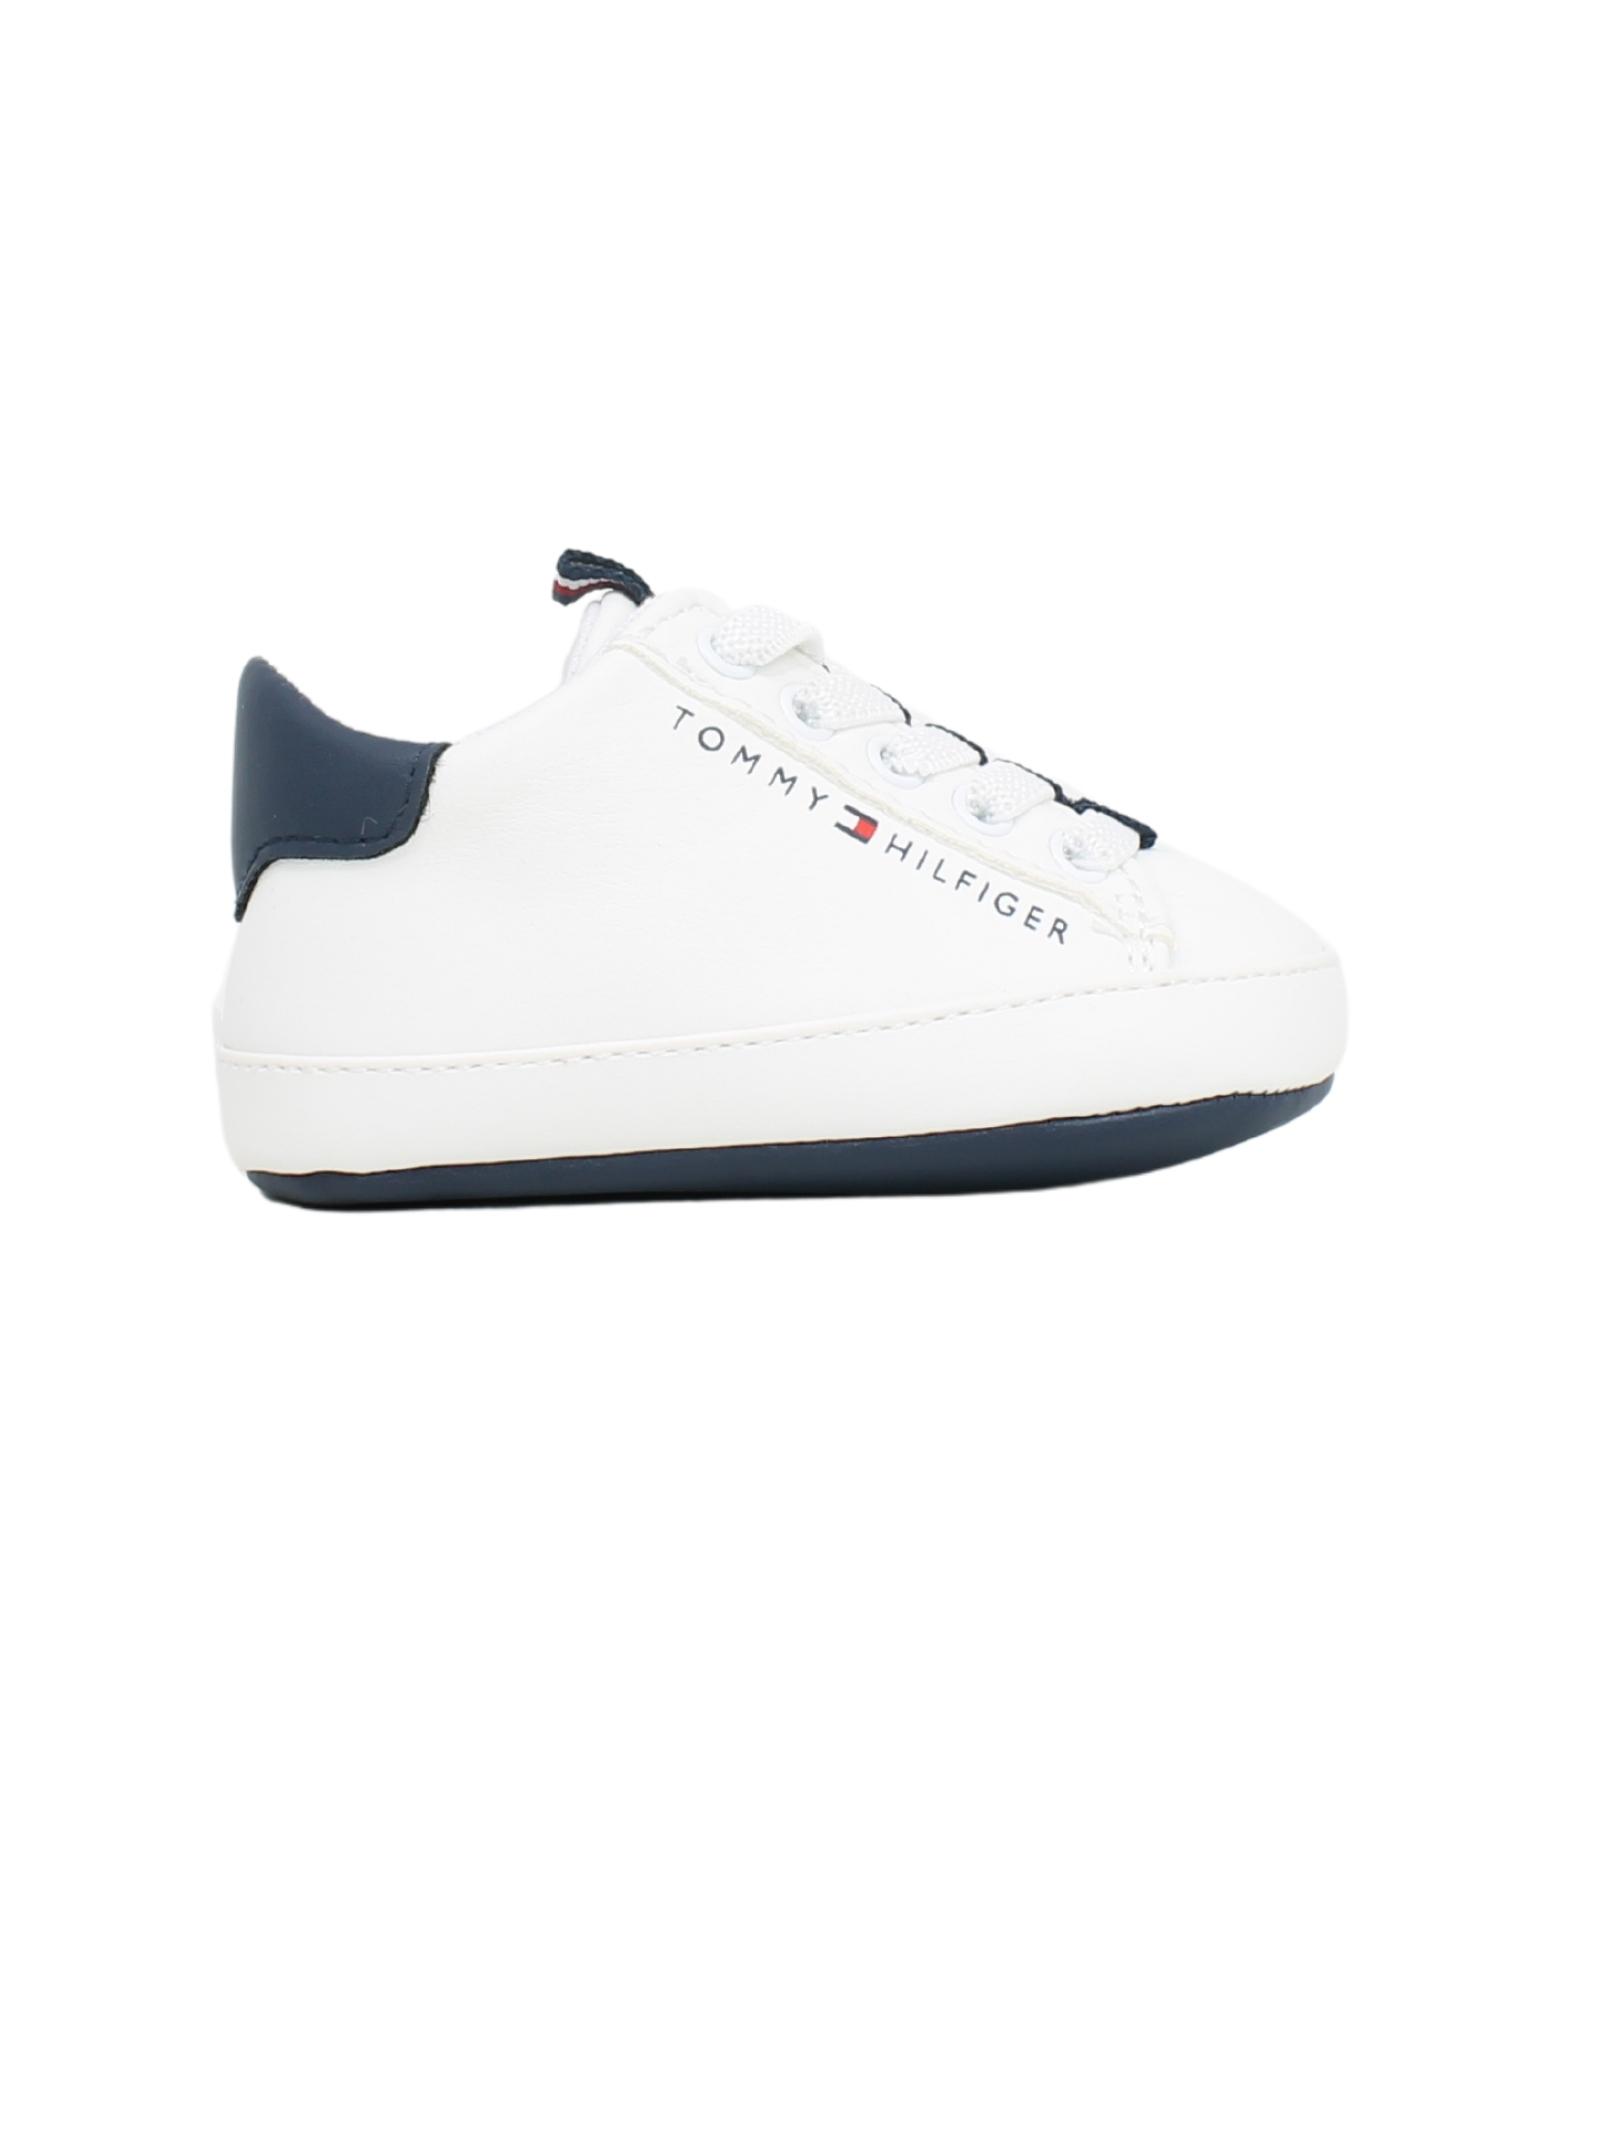 Fantasy Newborn Shoes TOMMY HILFIGER KIDS | Shoes | T0B4320370272X008BIANCO